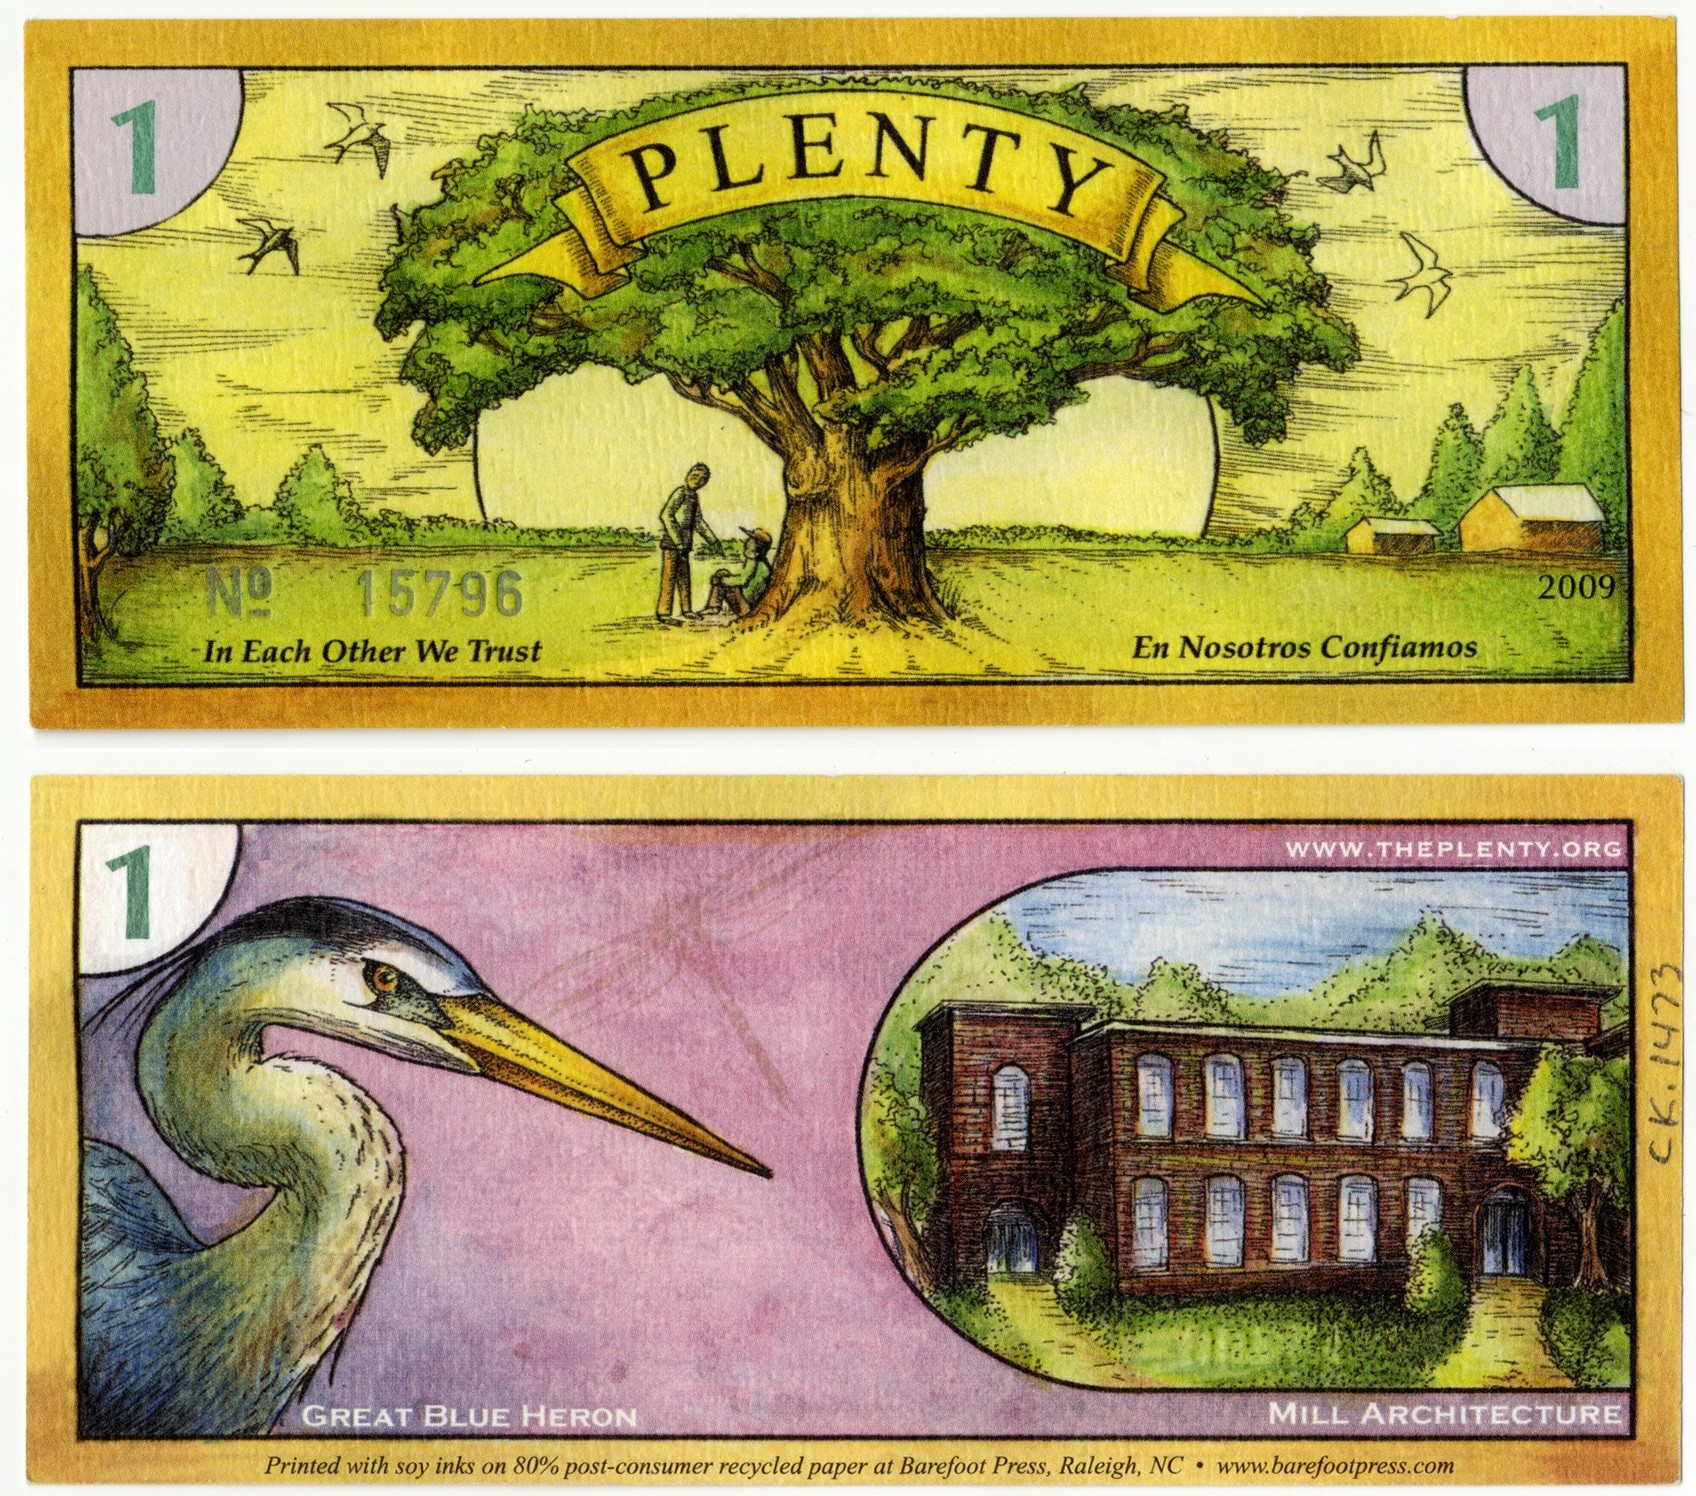 North Carolina PLENTY local currency, 2002